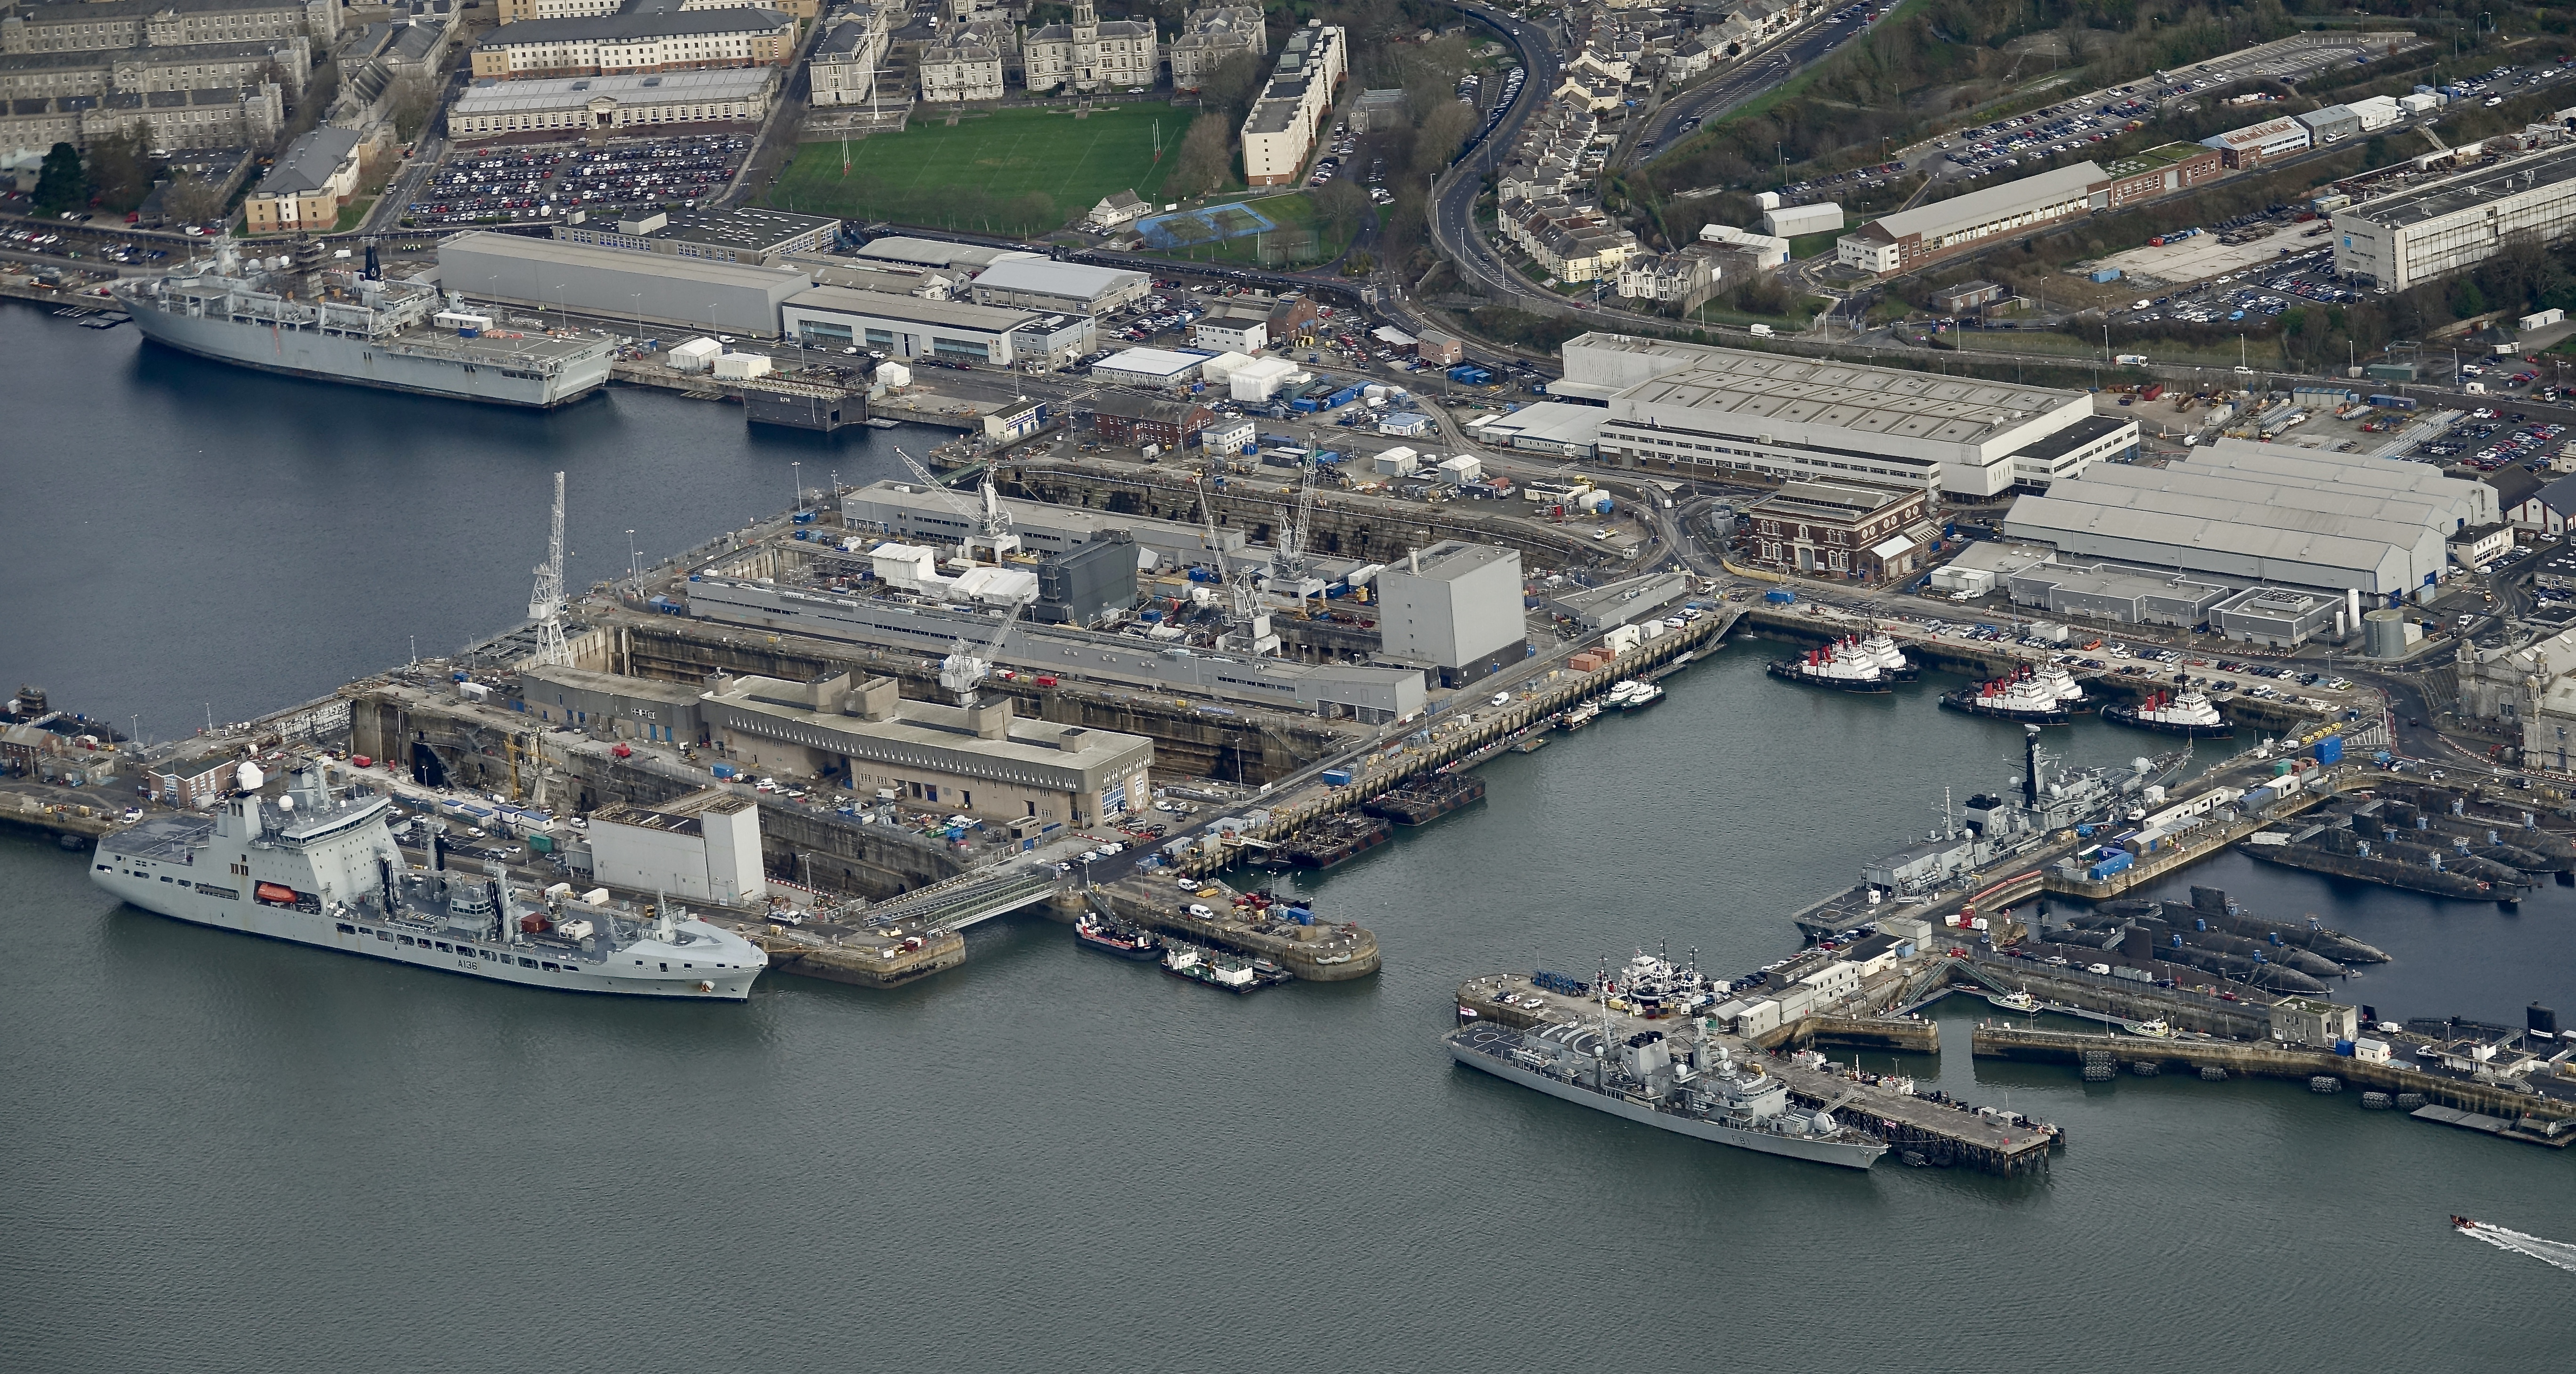 Royal Navy : les news - Page 5 46651153302_4ca792870e_o